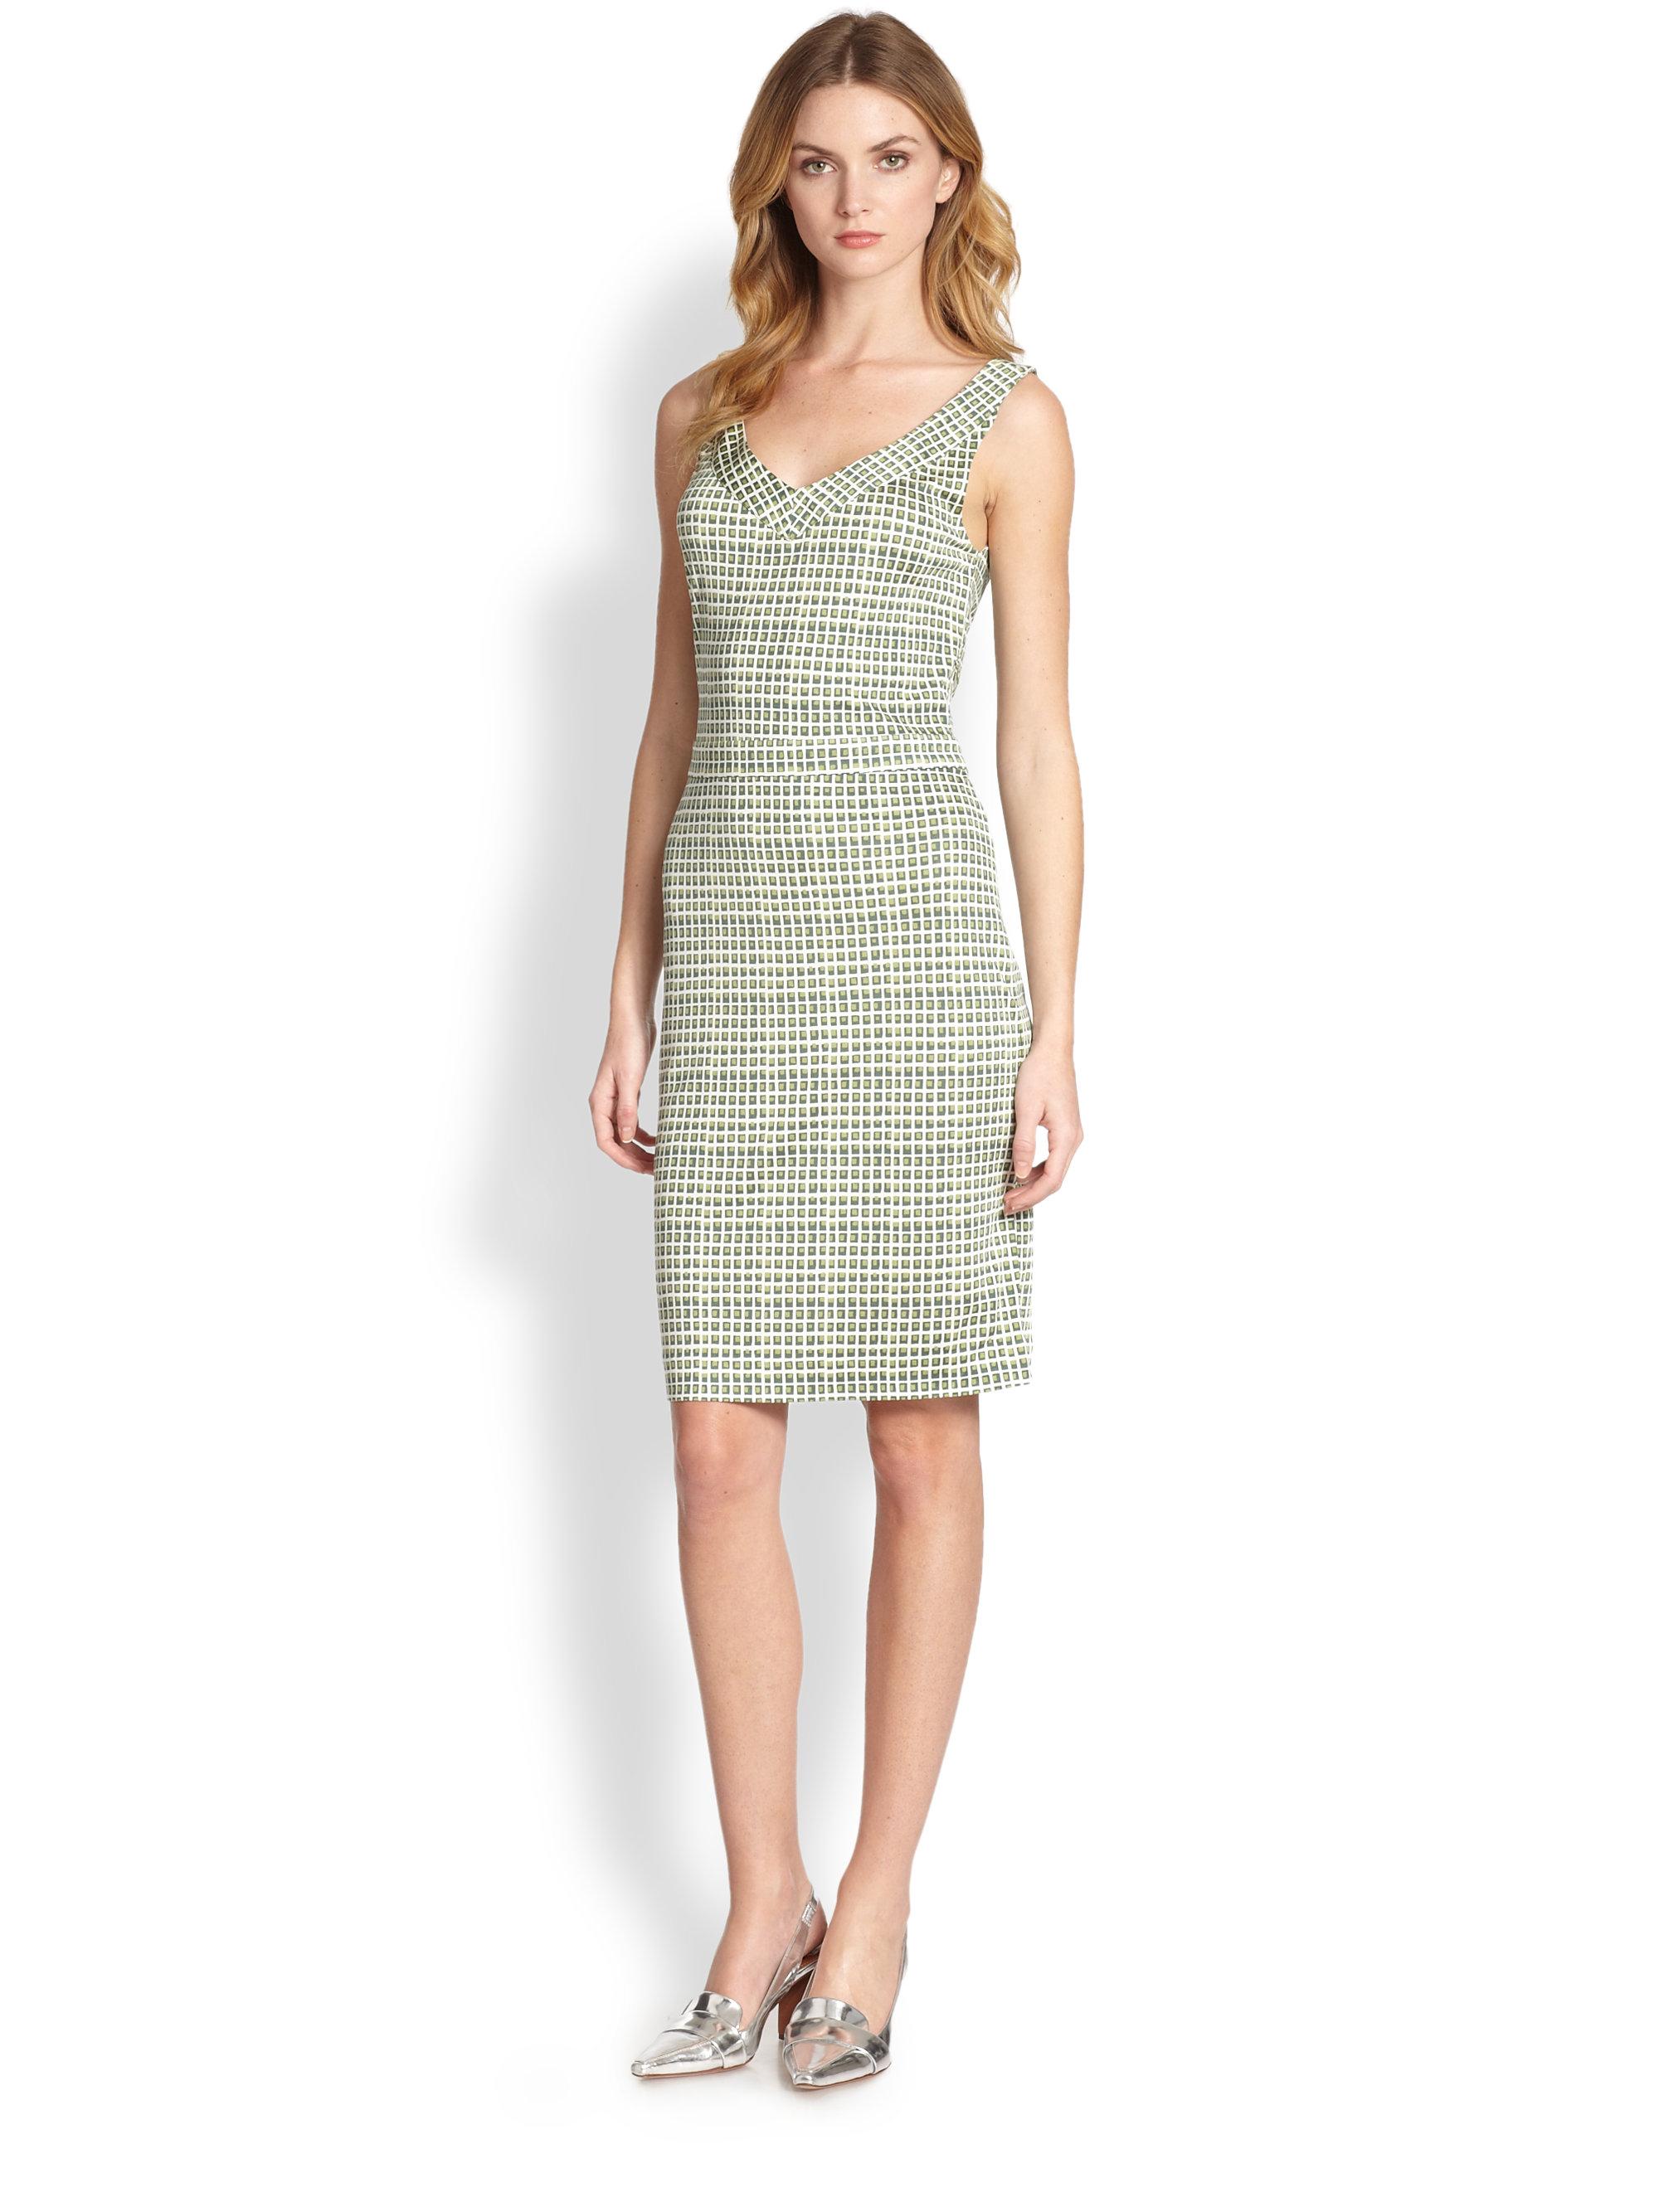 Green silk dress Tory Burch Cheap Sale Authentic ADyGl0